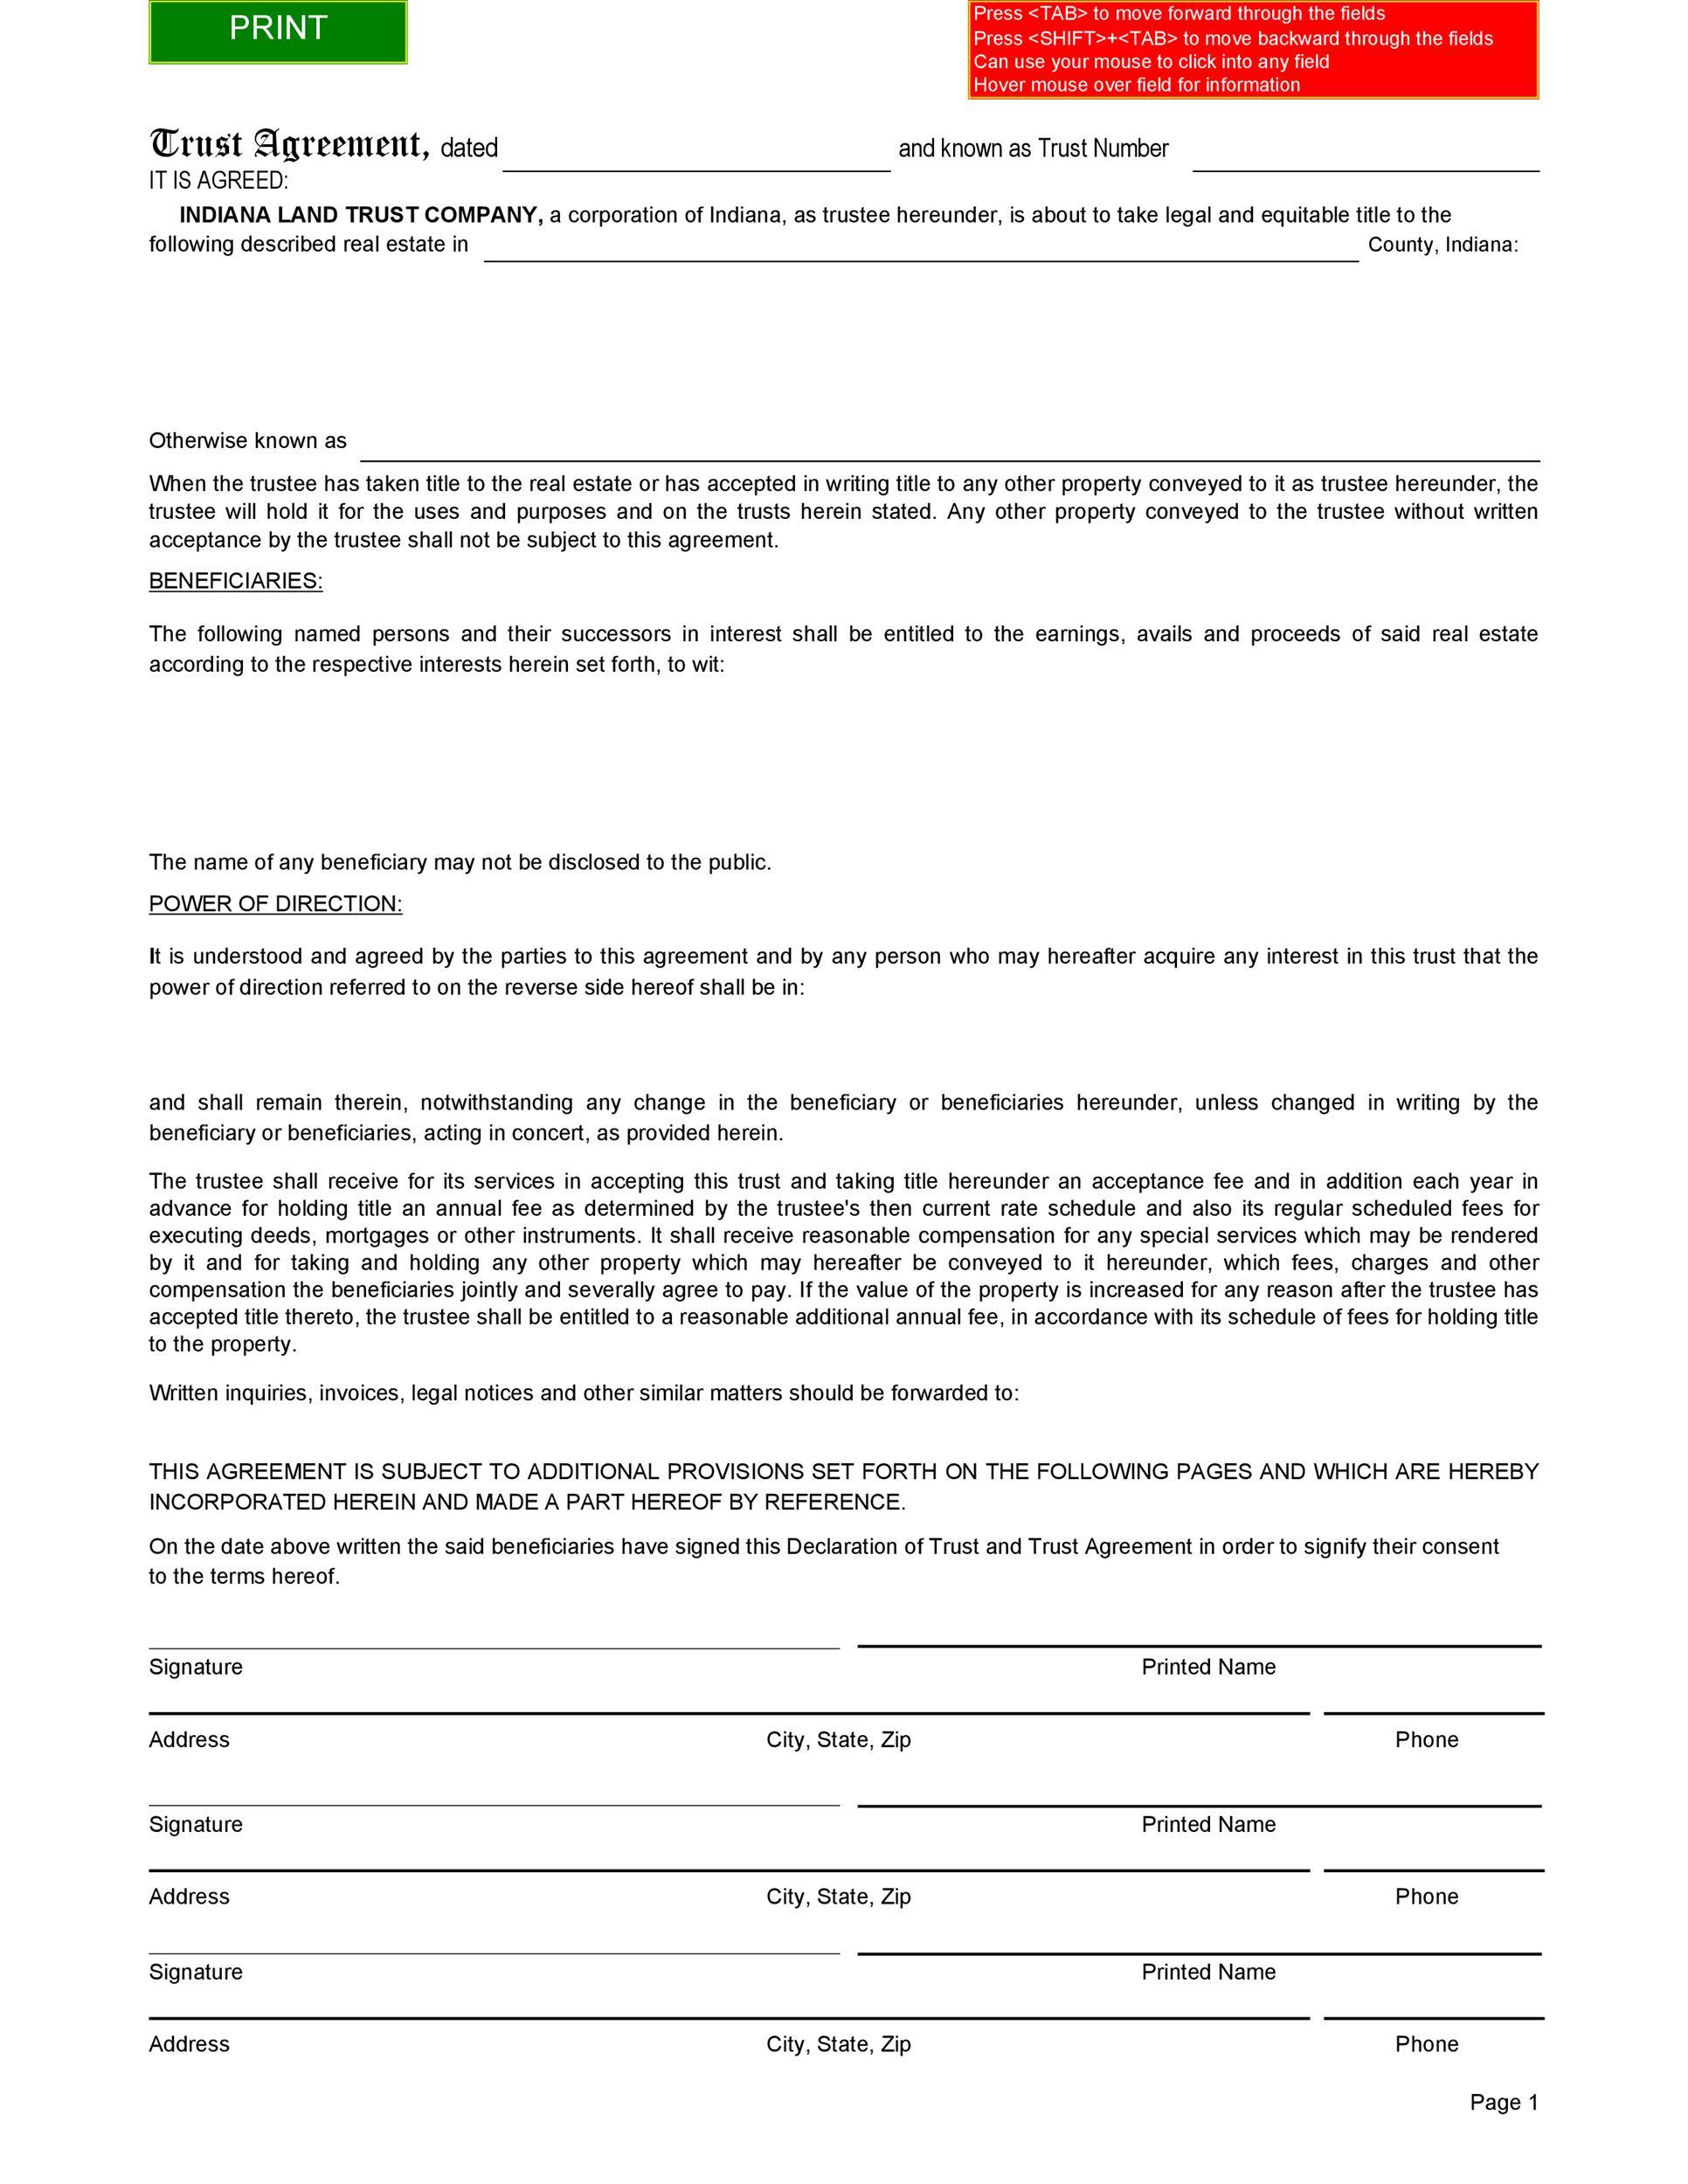 Free trust agreement 33